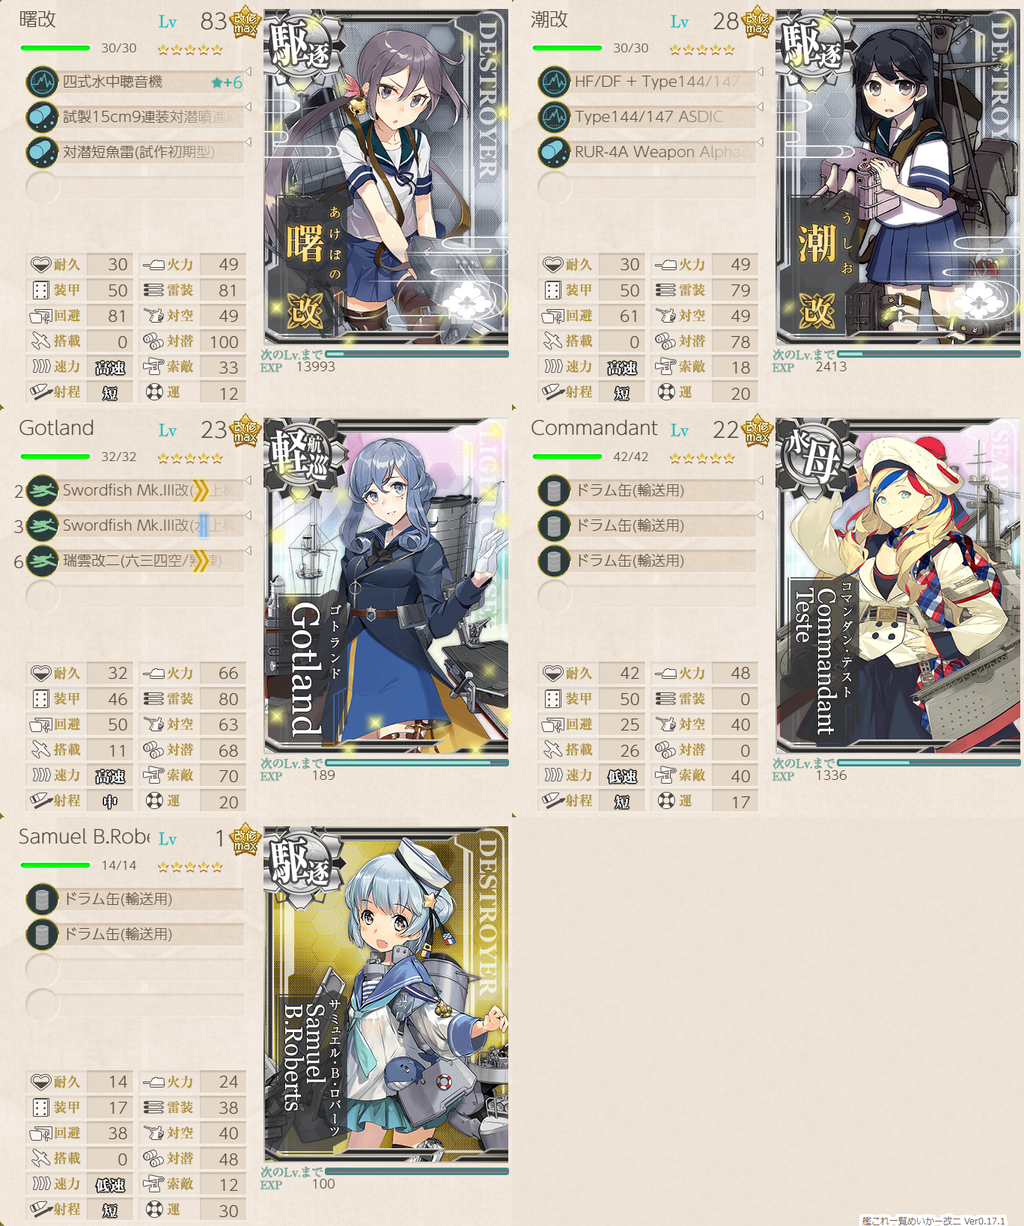 キ 船団 鎮魂 504